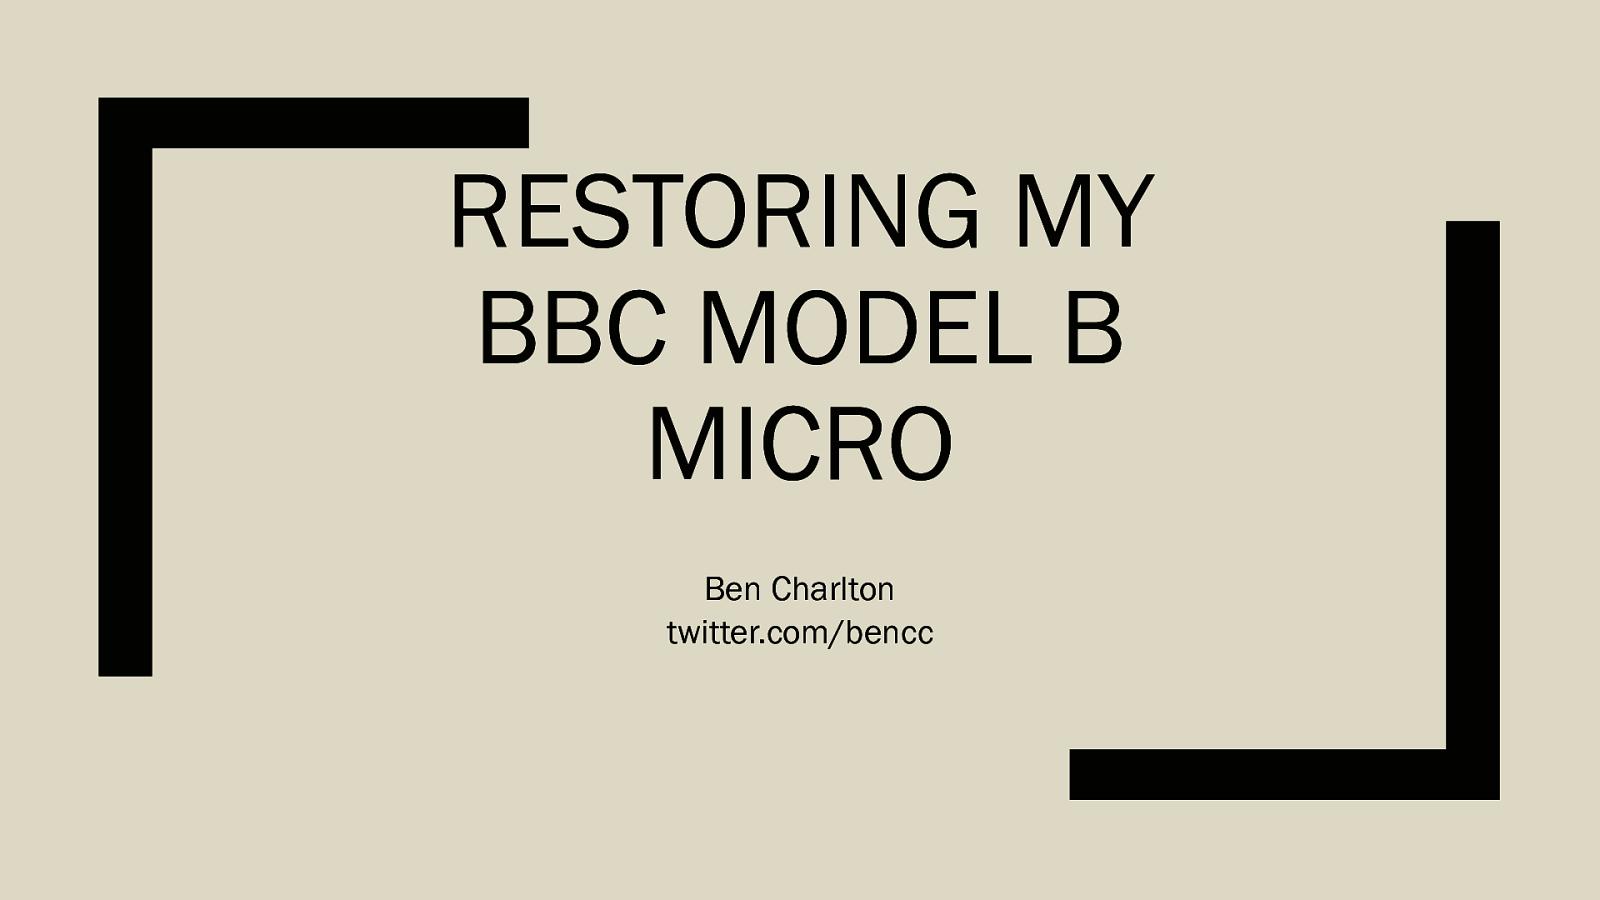 Restoring my BBC Model B Micro